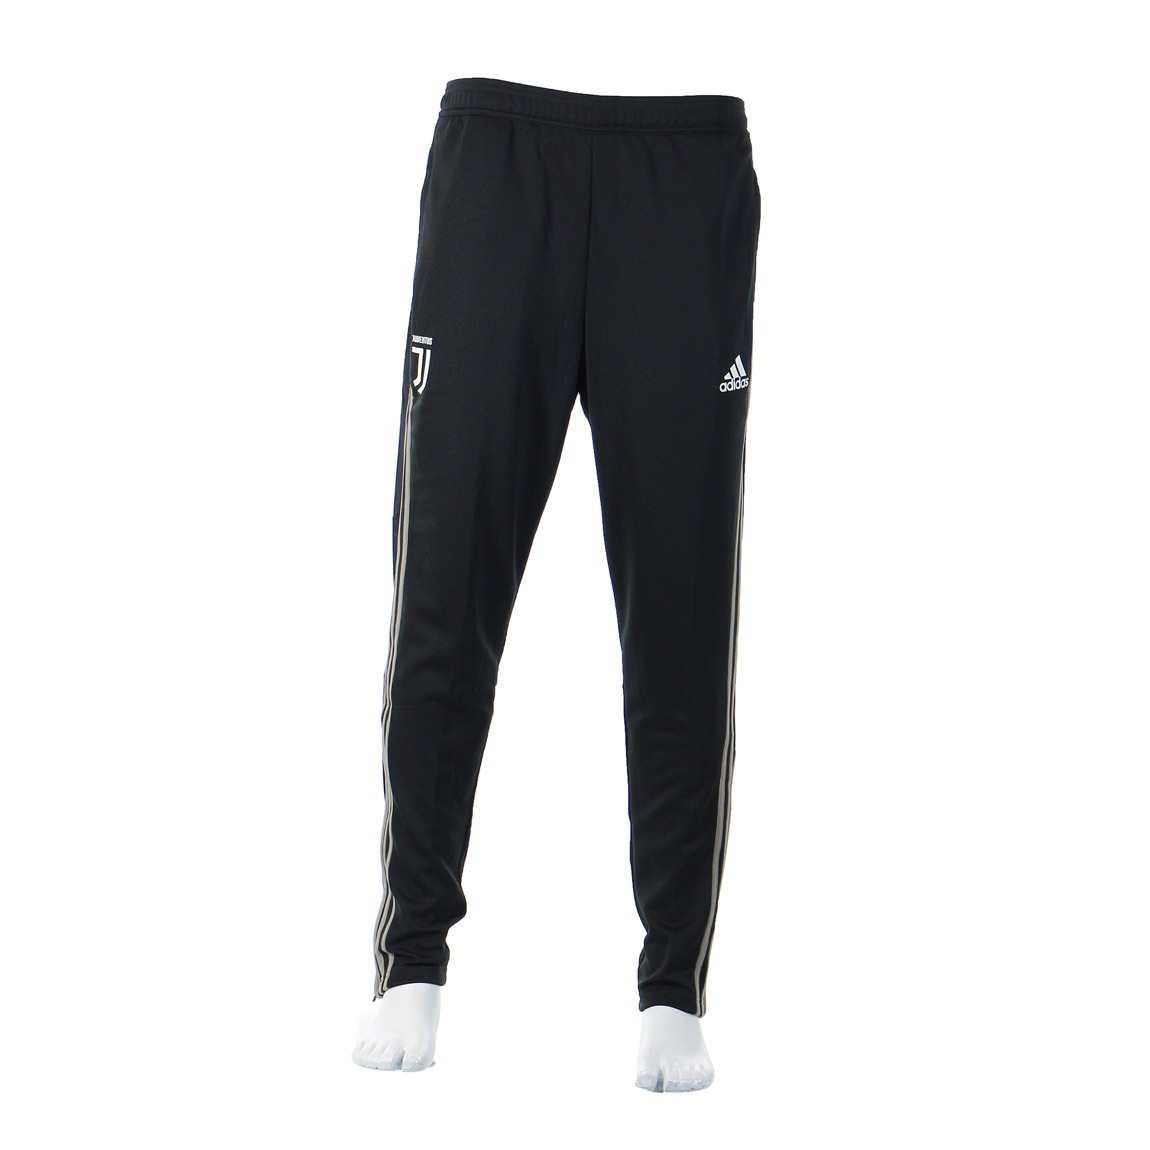 Pantalón Adidas Pnt De Juventus Hombre Tr kPOZuiXT